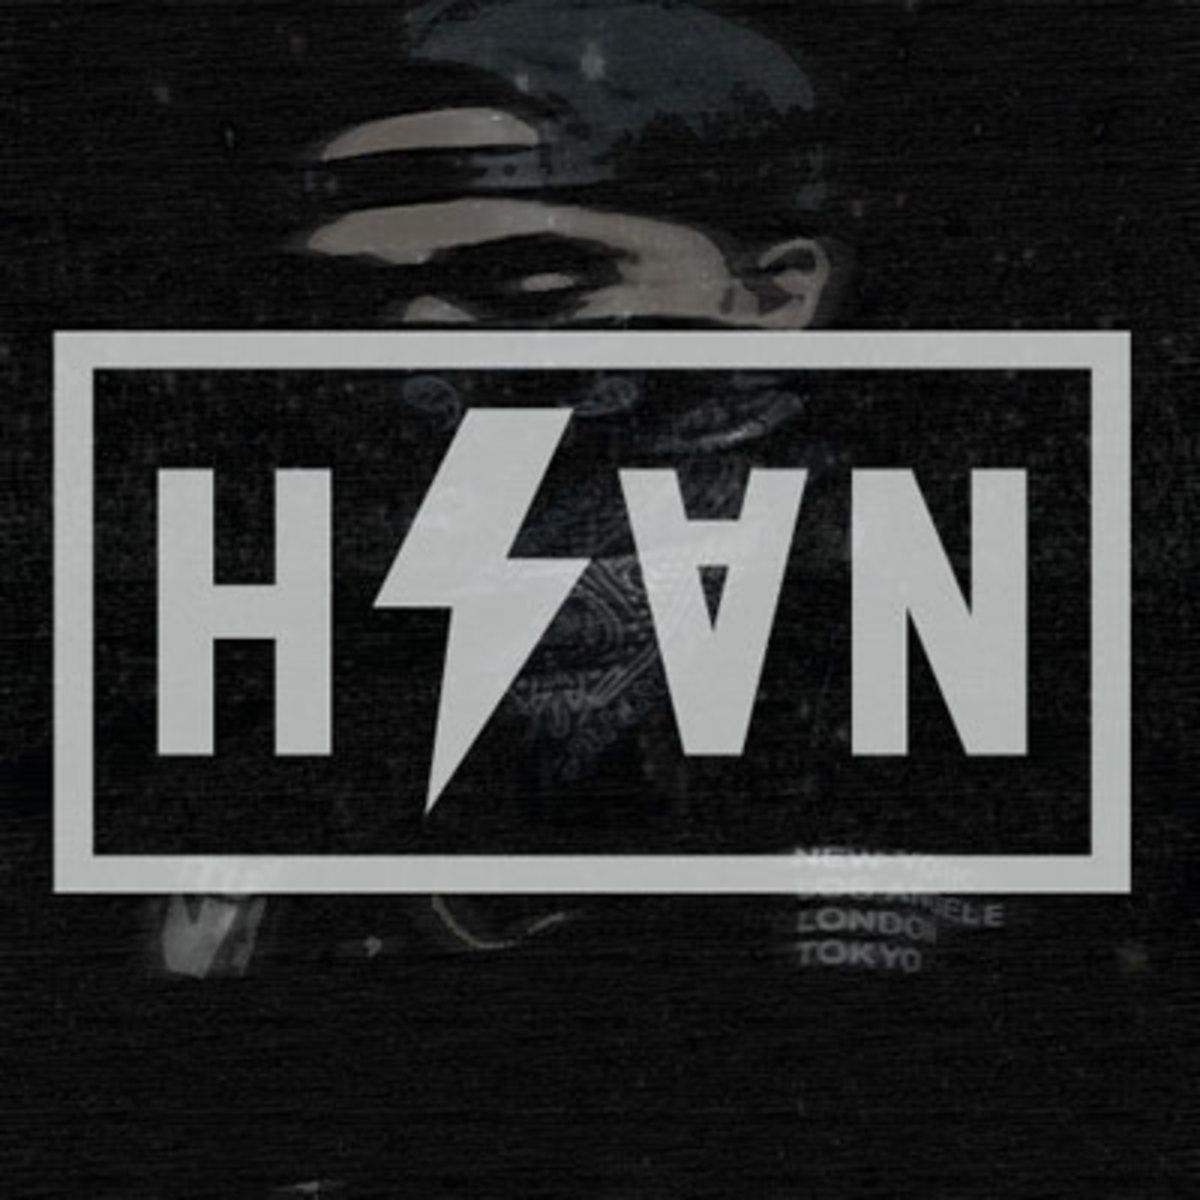 hsvn-ep.jpg